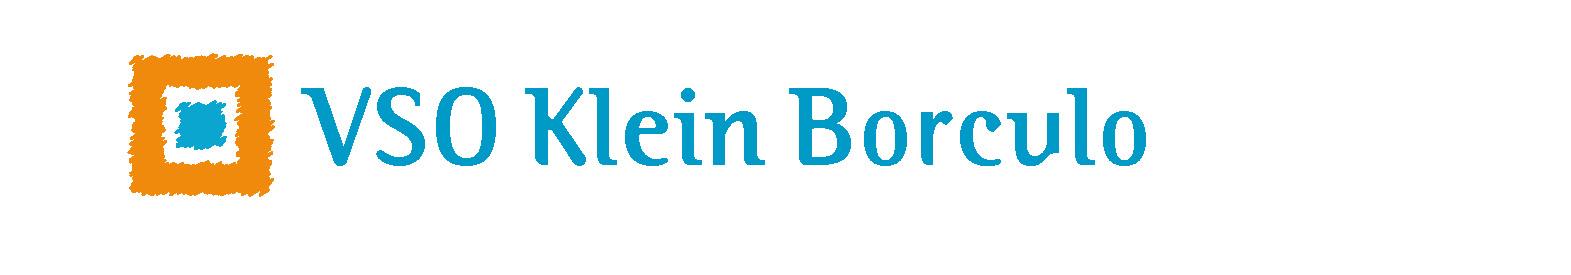 VSO Klein Borculo